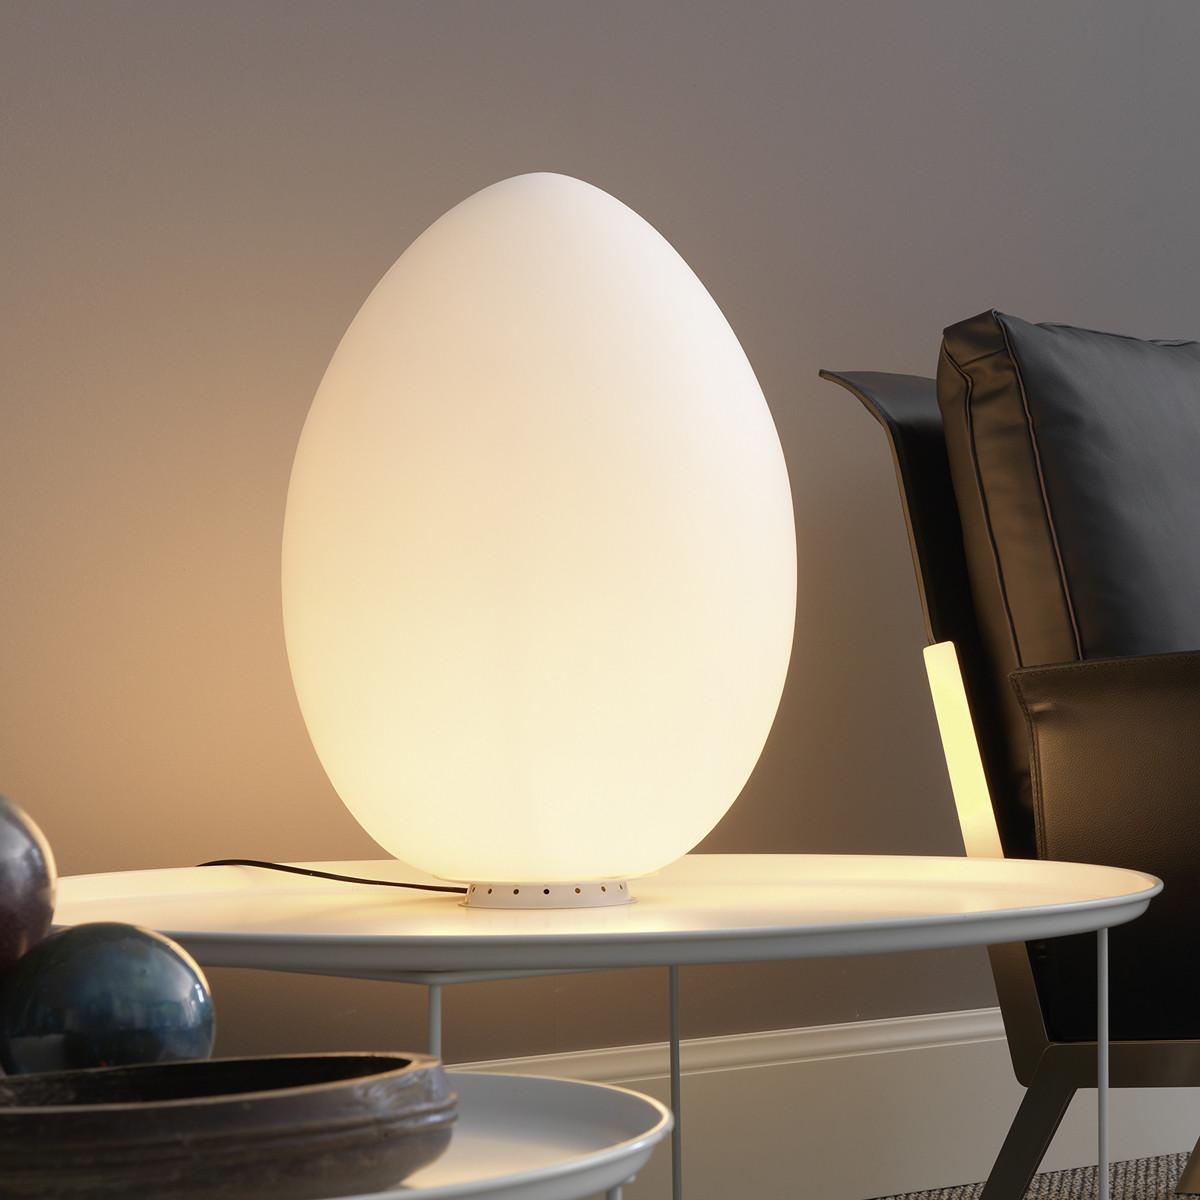 fontana arte uovo tischleuchte mit dimmer casa de. Black Bedroom Furniture Sets. Home Design Ideas